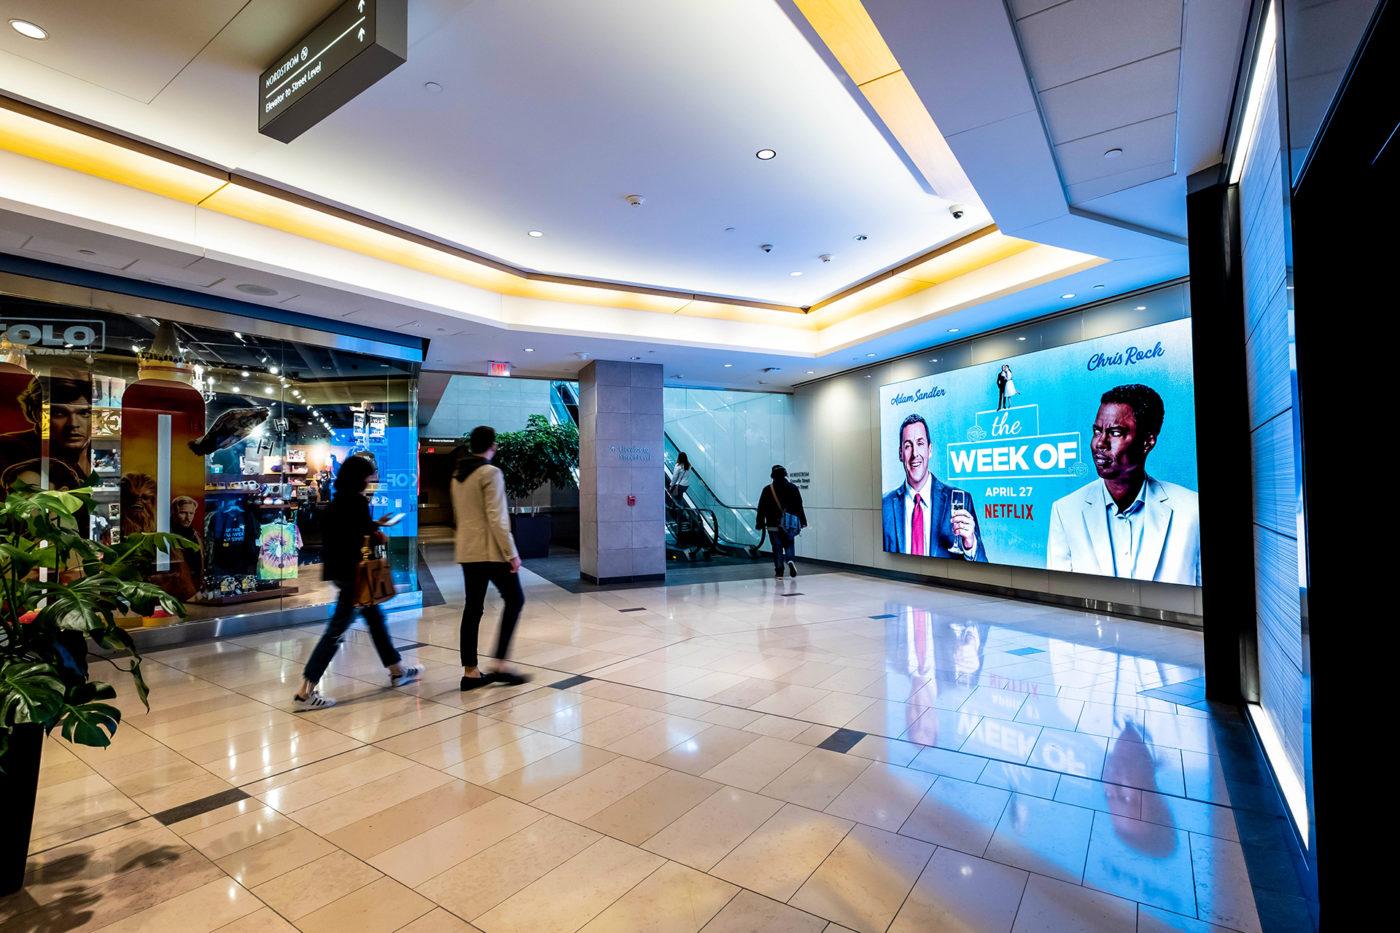 Netflix – The Week Of - Malls - CF Pacific Mall - Digital Spectacular (Markham, Ontario)